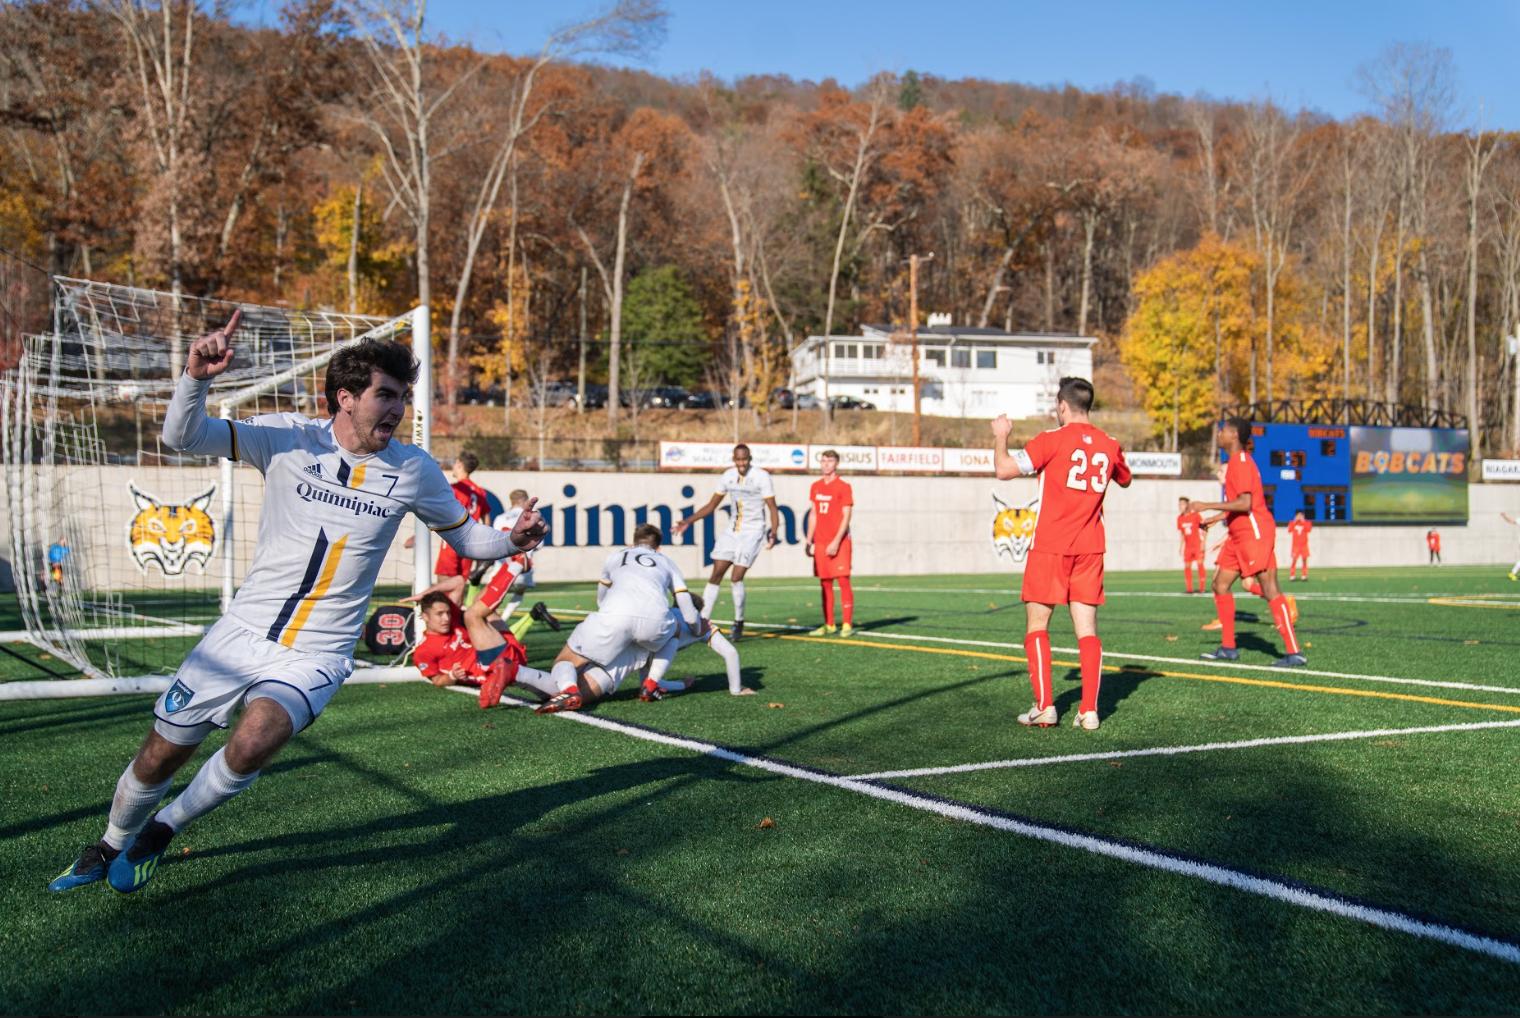 Quinnipiac men's soccer prevails in shootout vs. Marist, advances to MAAC Championship